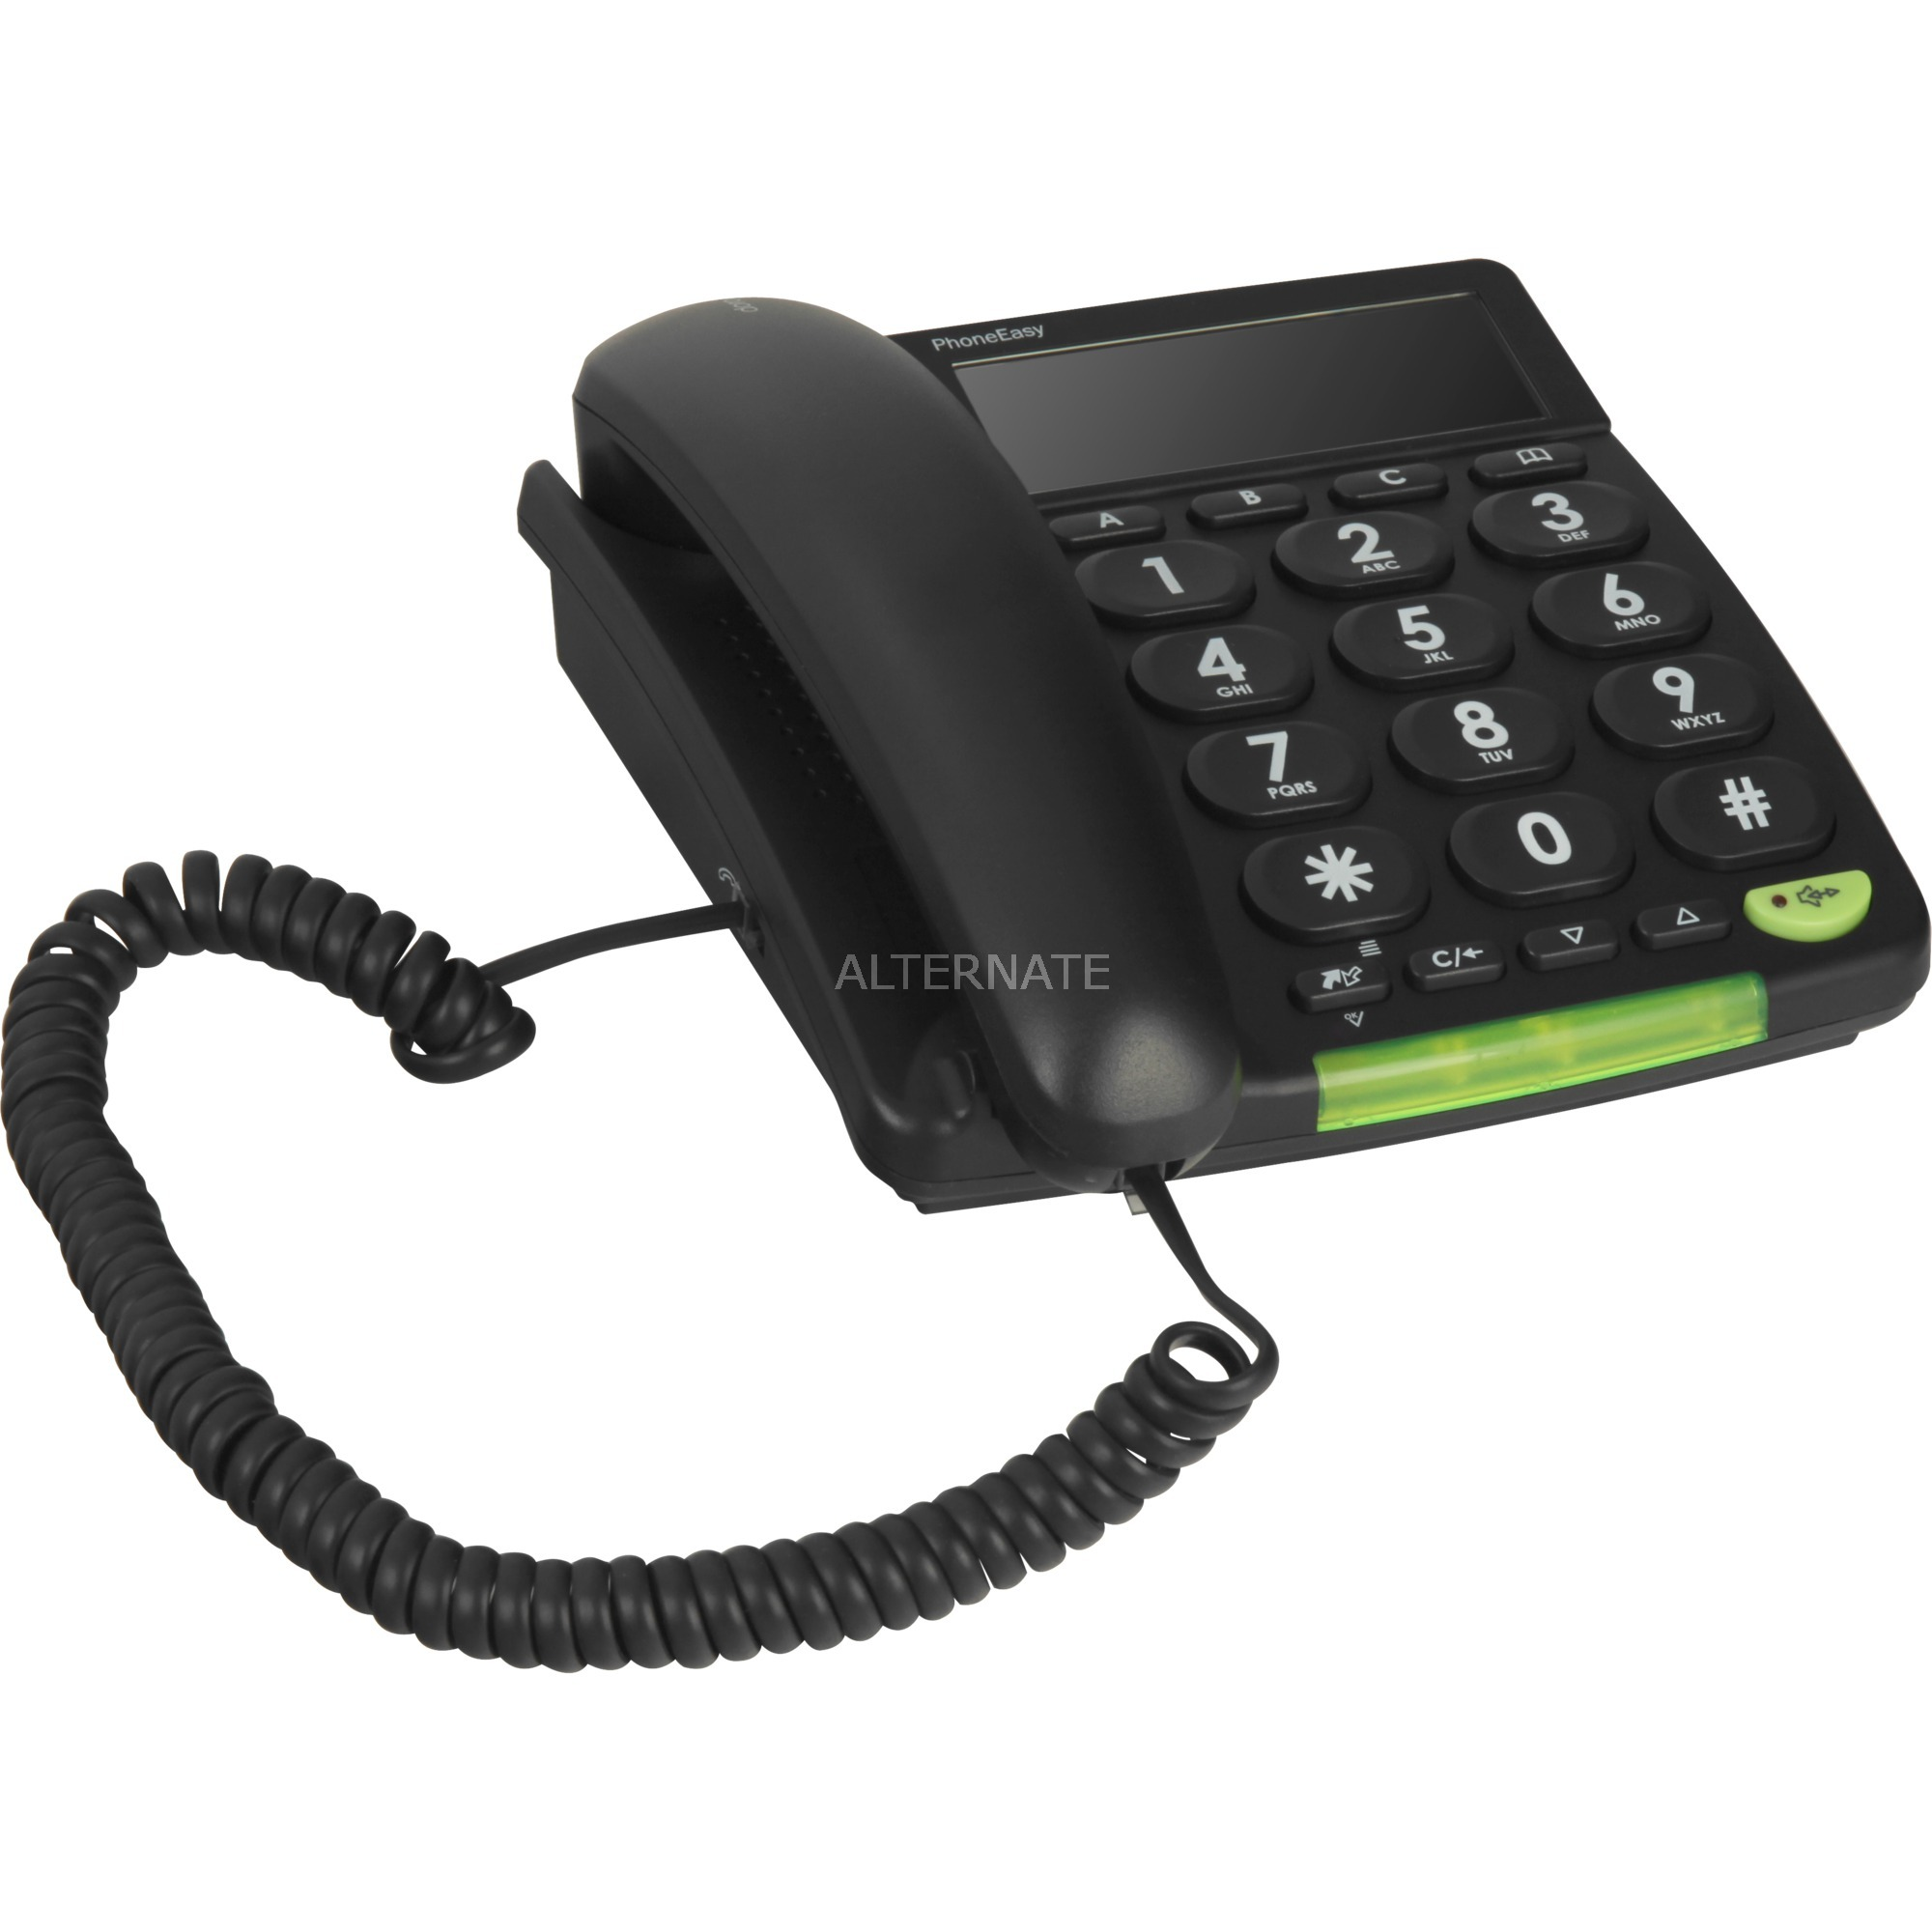 312CS Negro Identificador de llamadas, Teléfono analógico